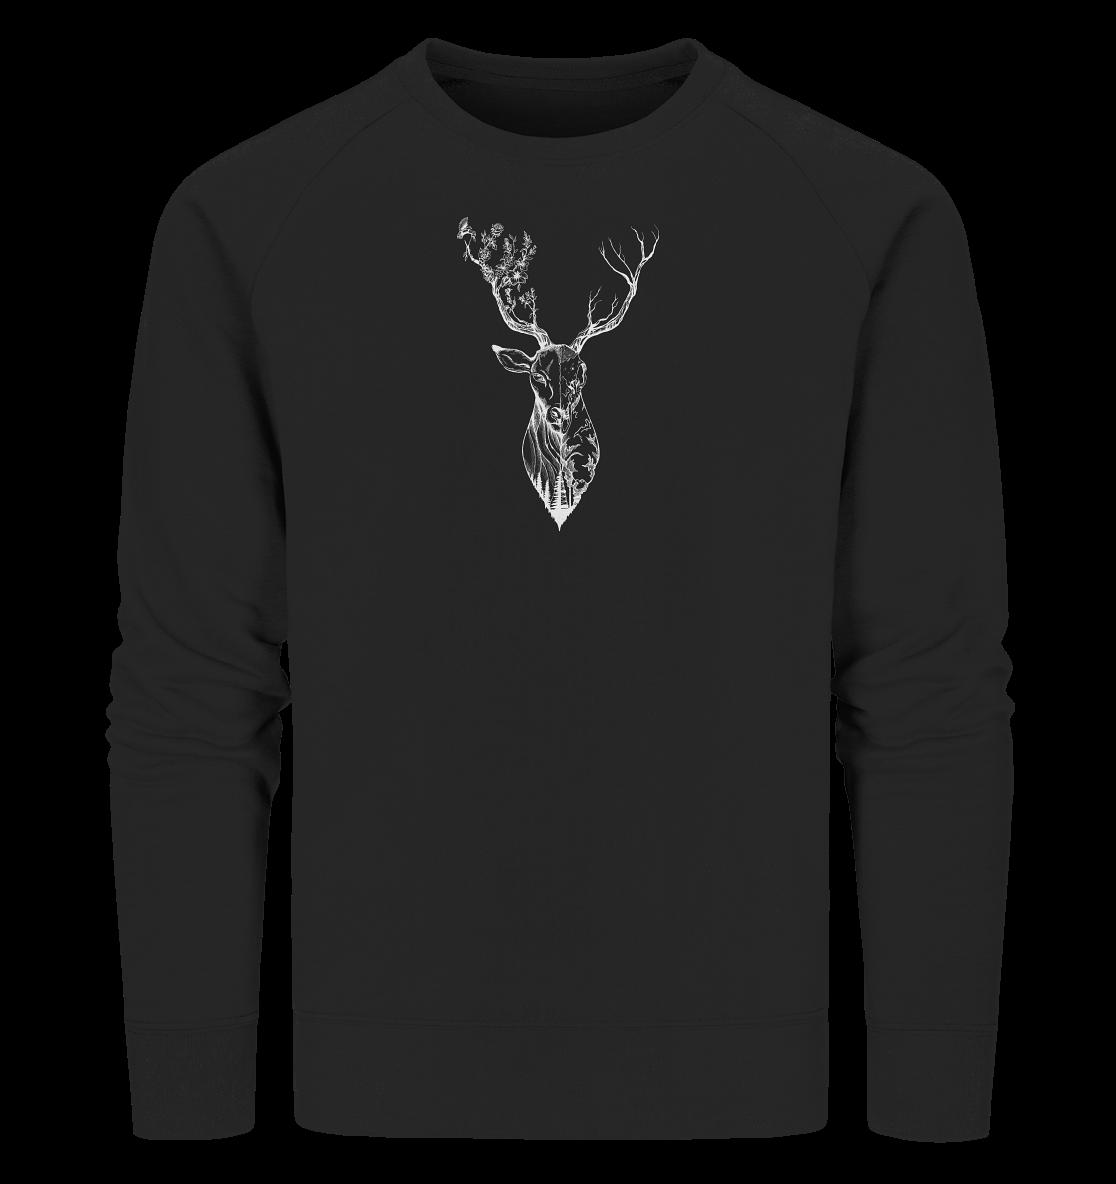 front-organic-sweatshirt-272727-1116x-5.png